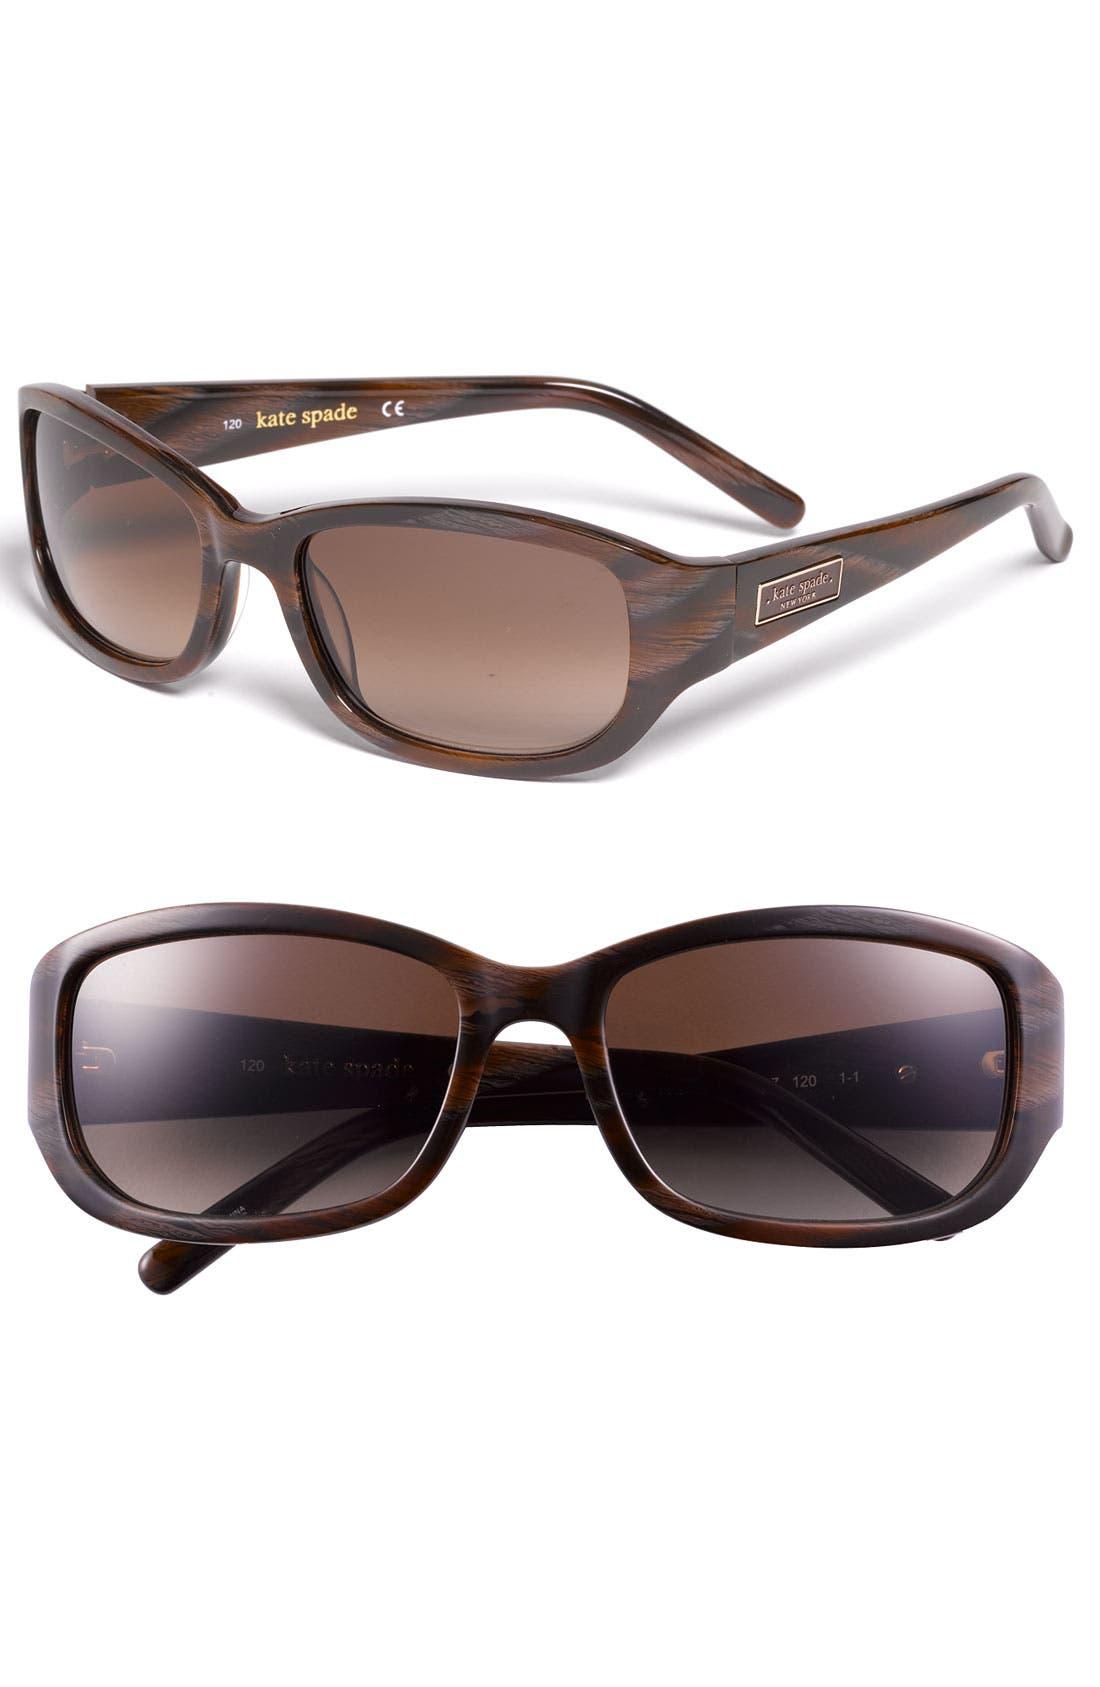 Main Image - kate spade new york 'diana' 54mm sunglasses